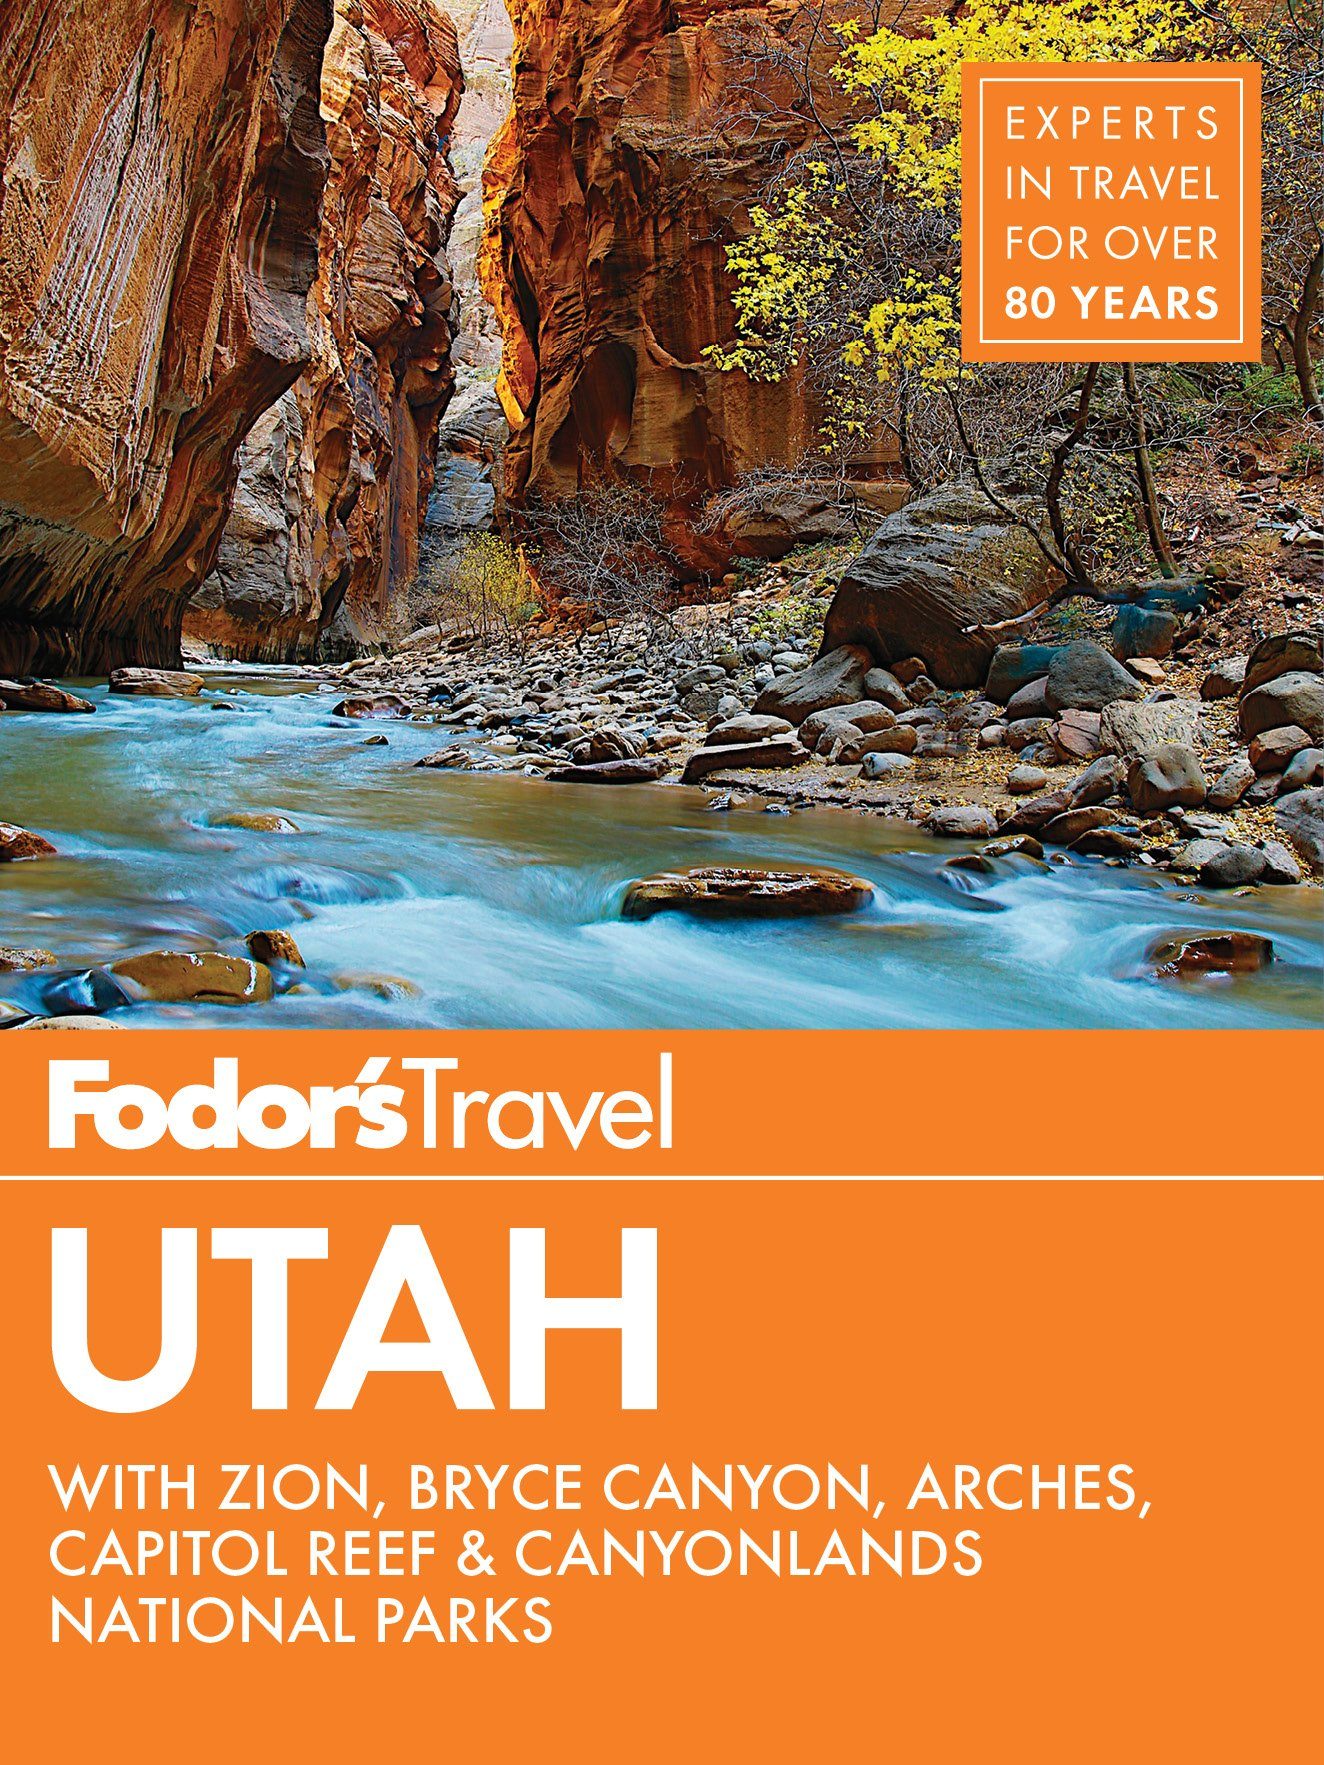 fodors escape to the american desert 1st edition